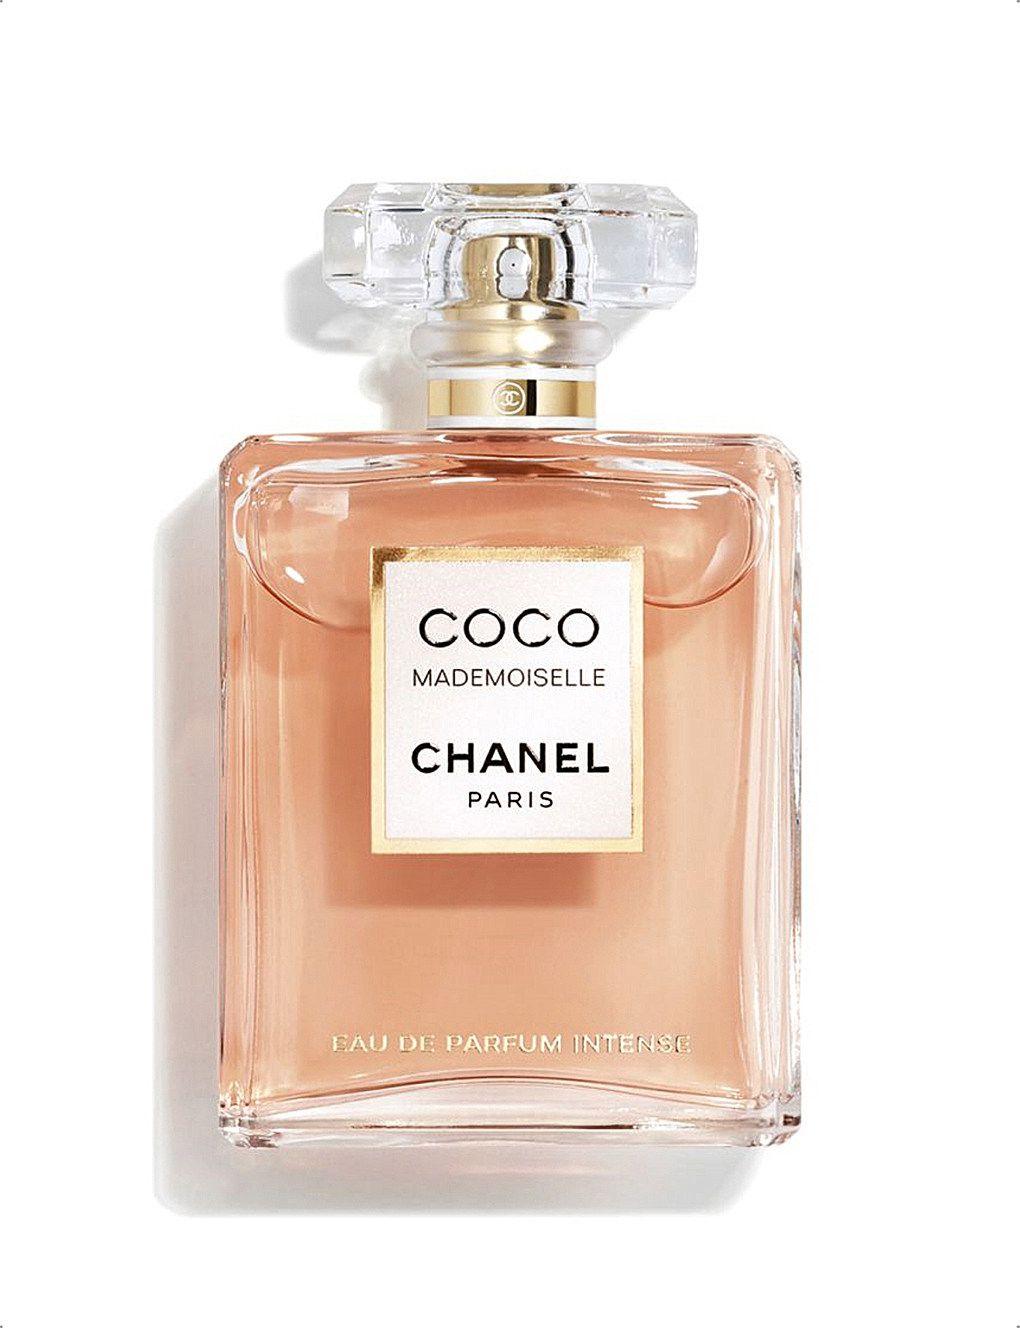 Chanel Coco Mademoiselle Eau De Parfum Intense 50ml In 2019 Make